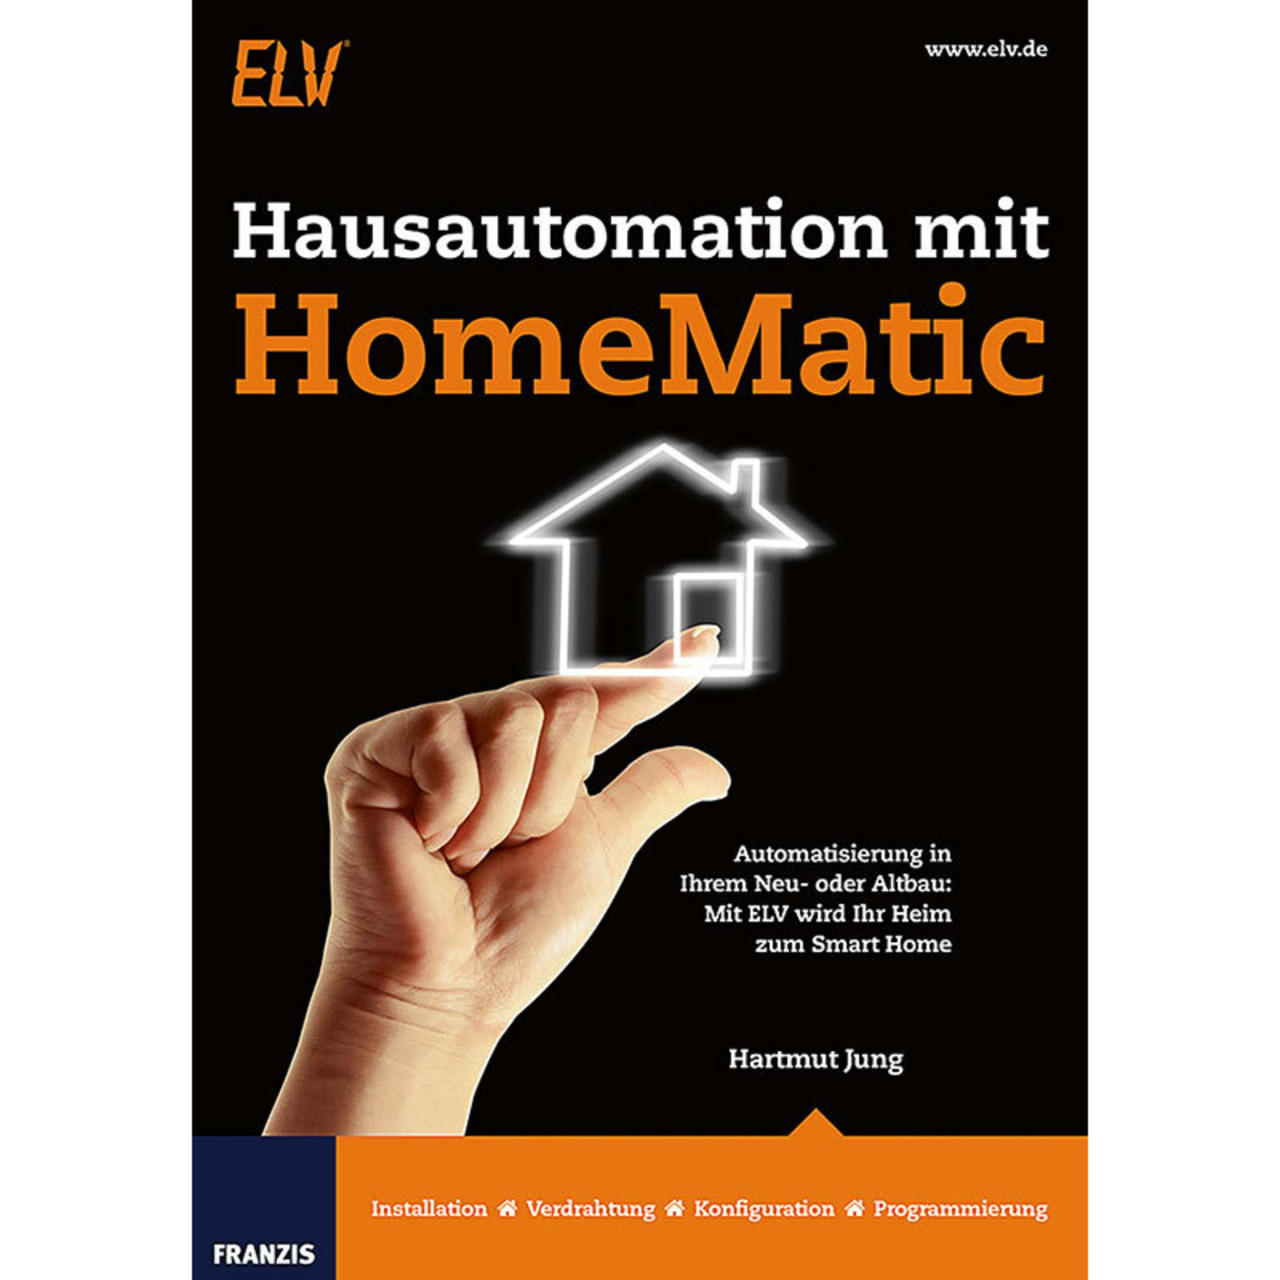 FRANZIS Buch Hausautomation mit Homematic